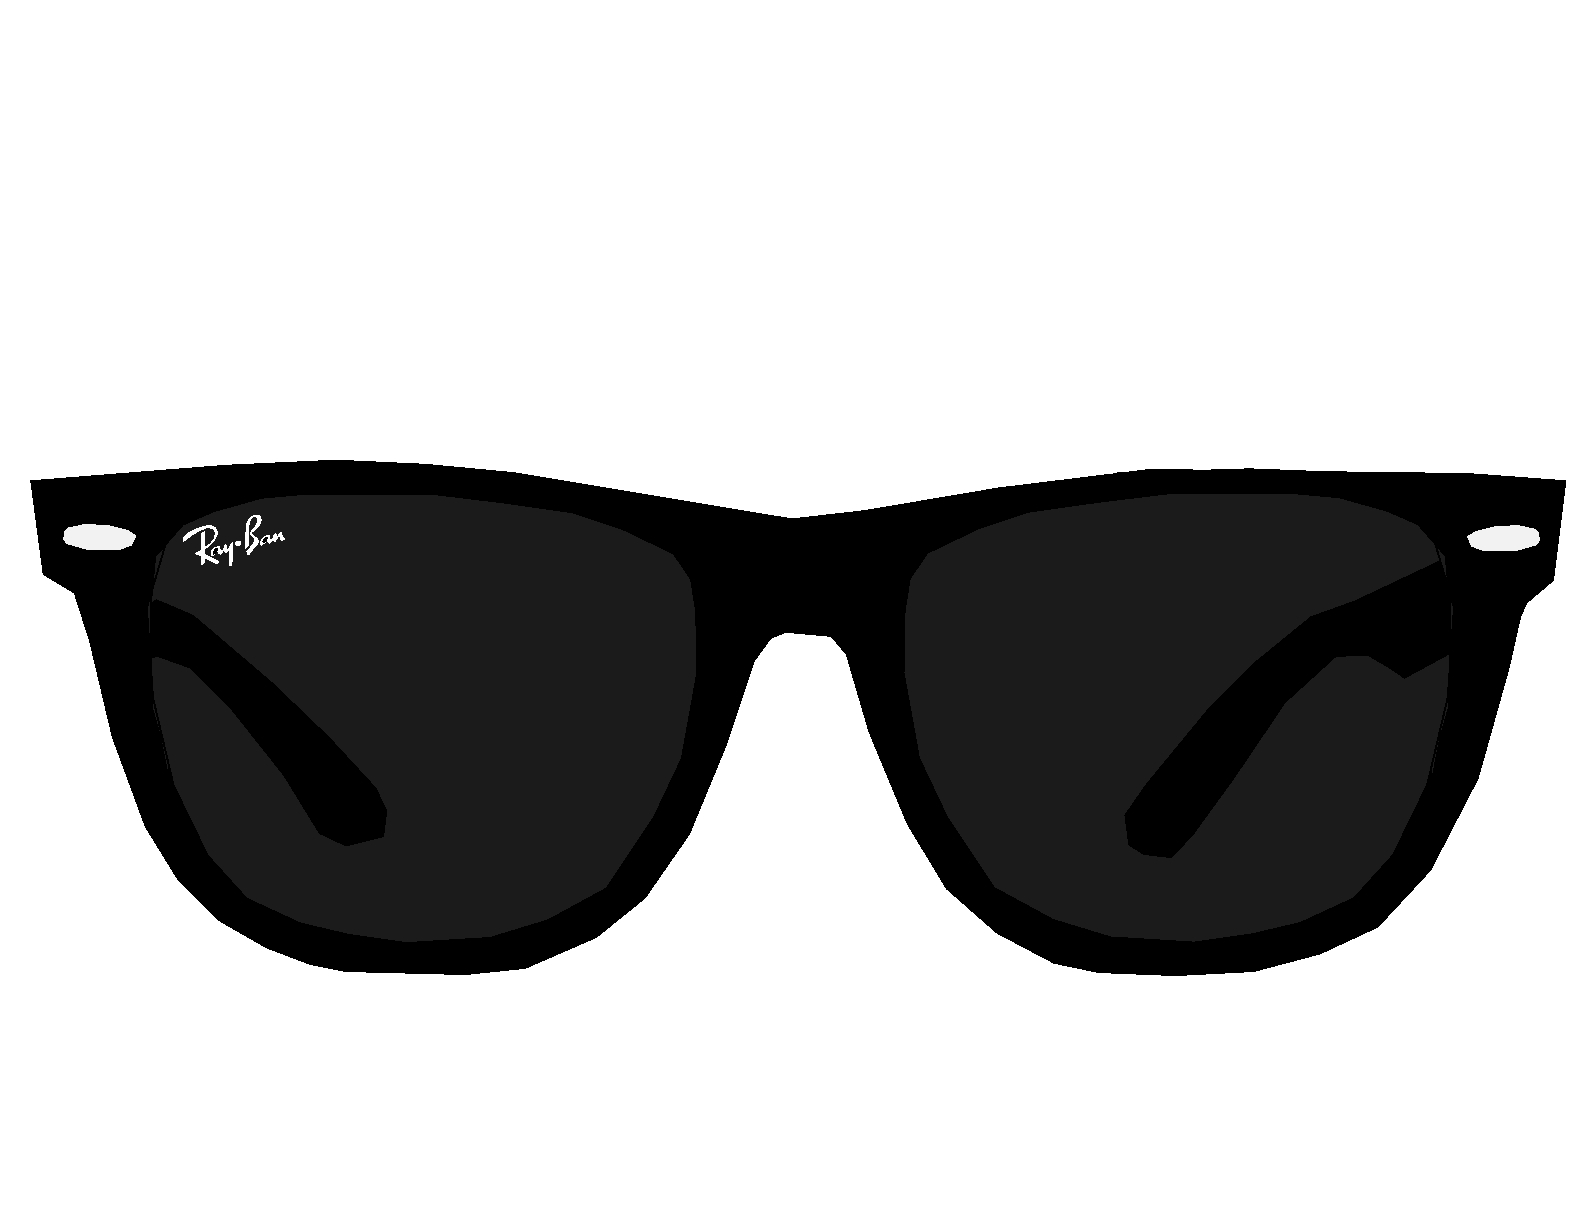 Aviator sunglasses clipart.